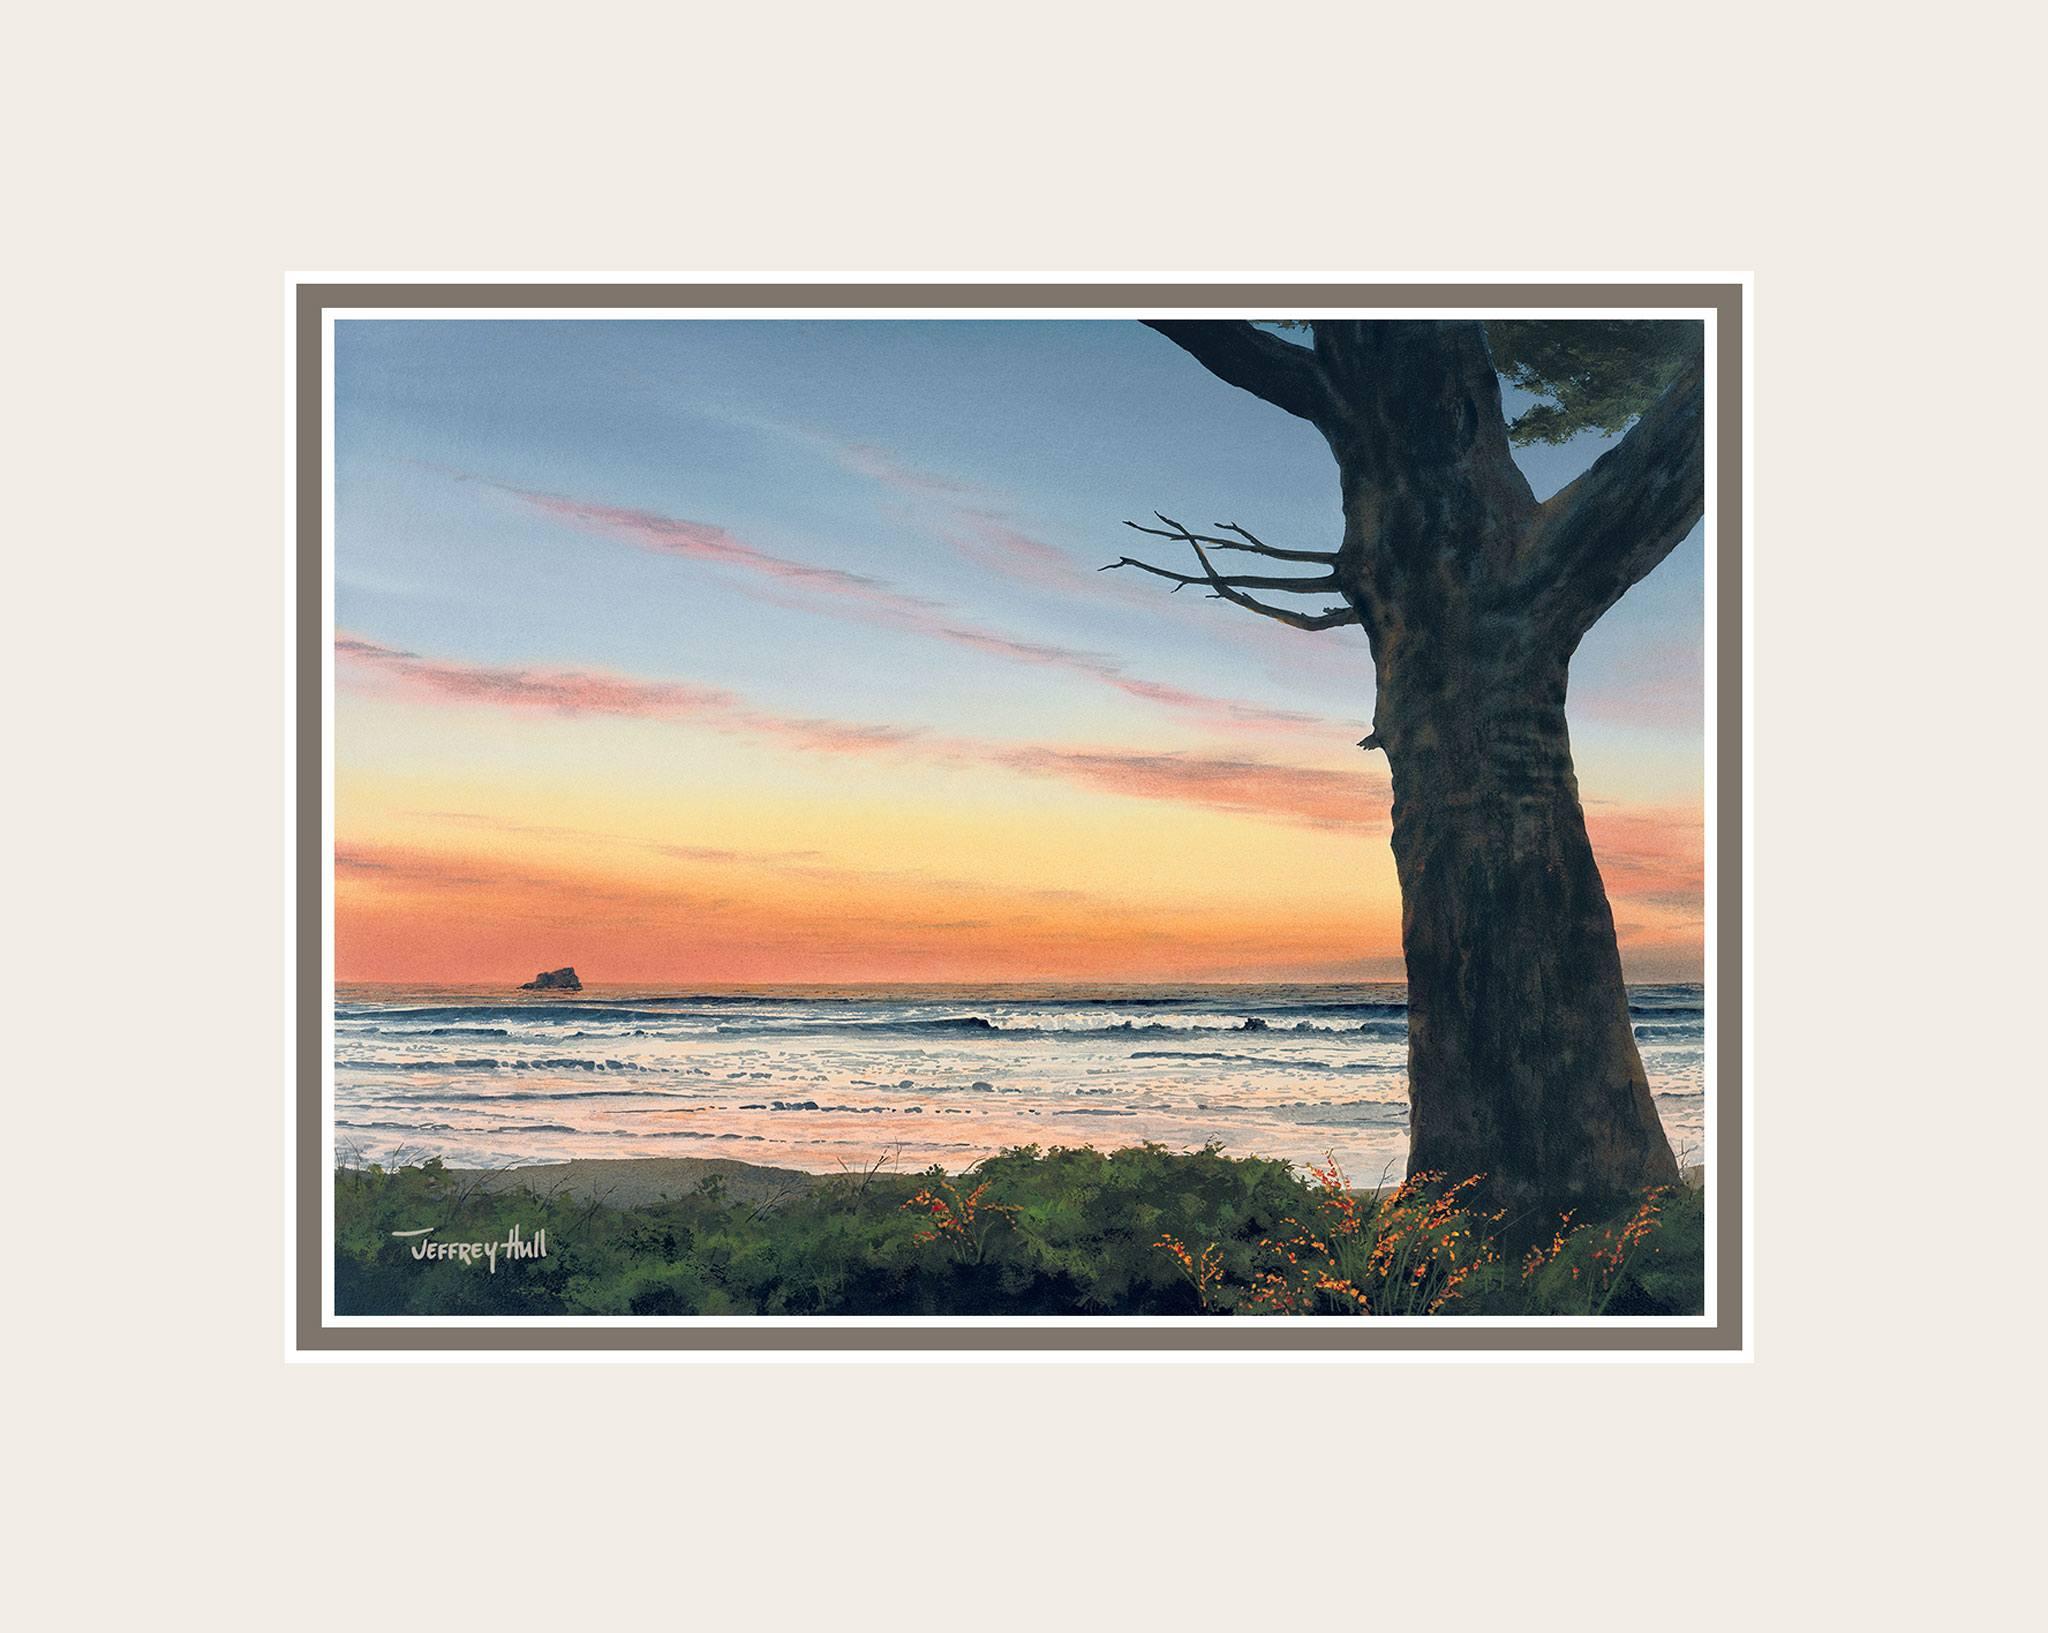 Sunset-Overlook-Mini-Unframed-Talc-Balmoral-4-Website-2021